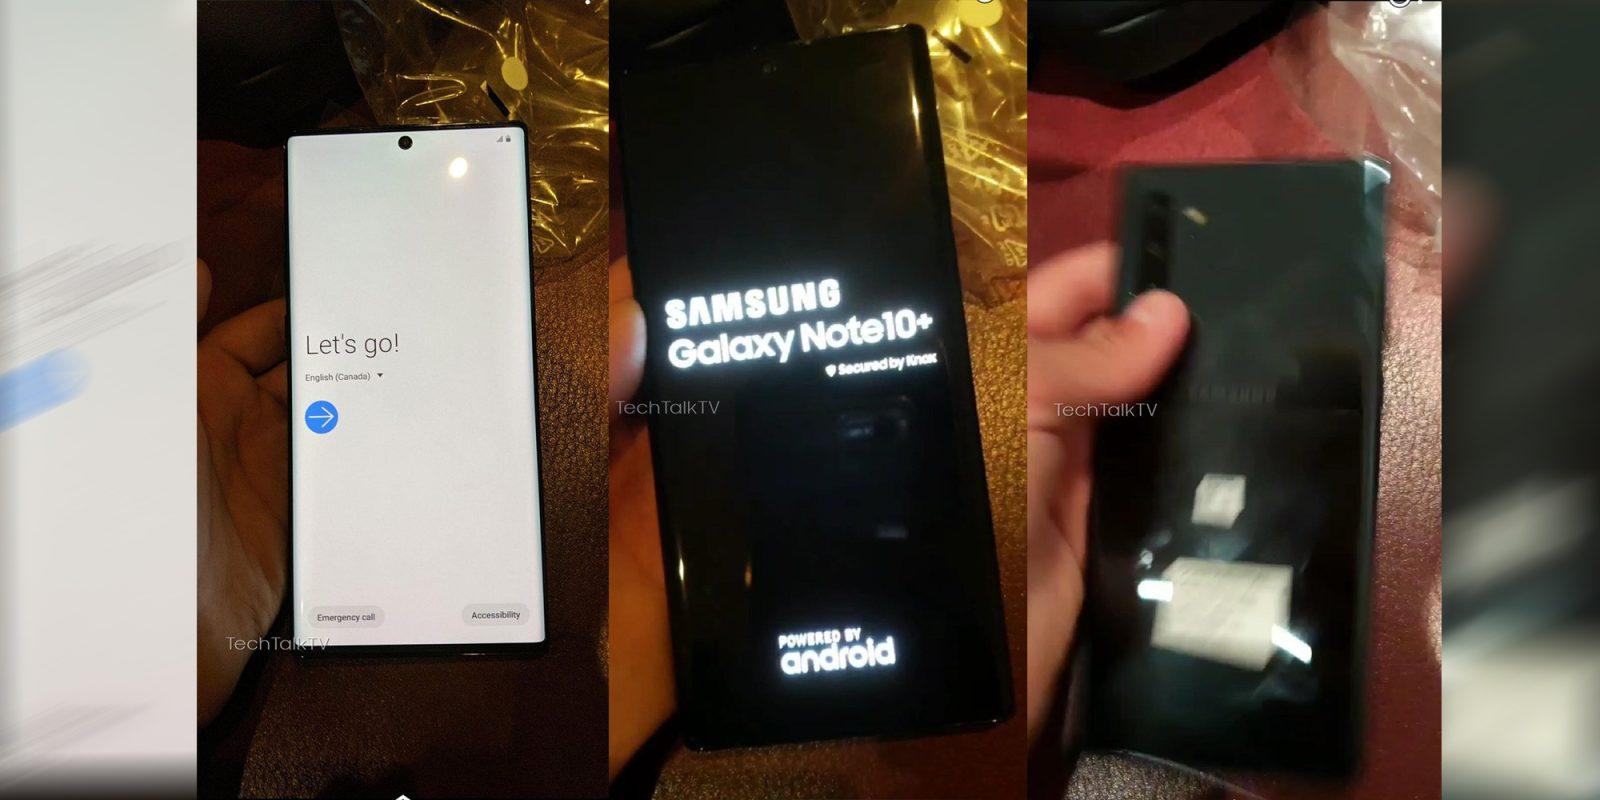 Galaxy Note 10+ hands-on images leak w/ near bezel-less design, punch-hole notch